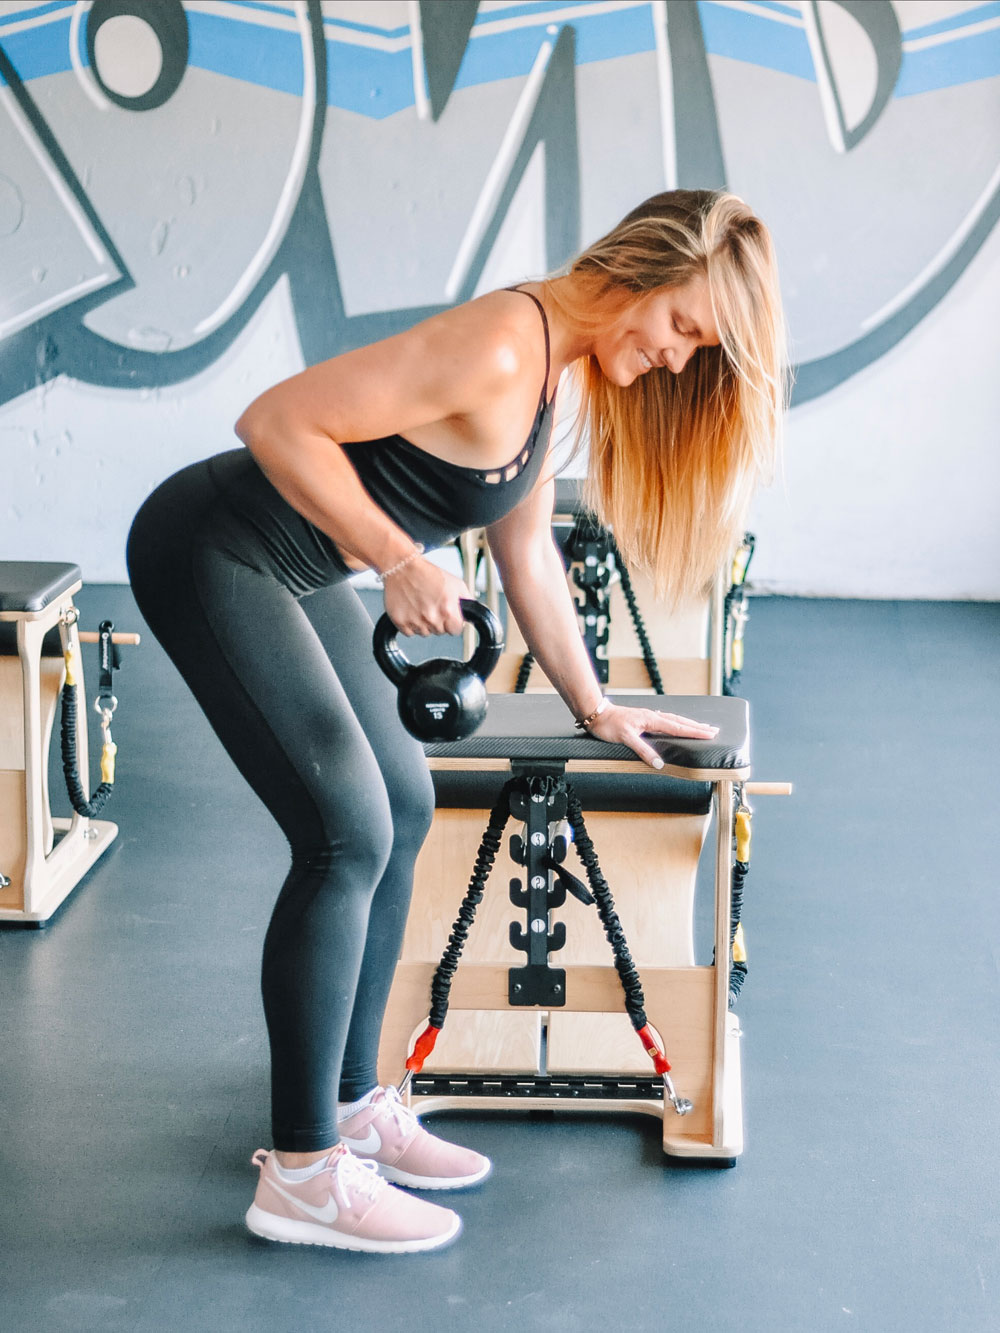 okc fitness class